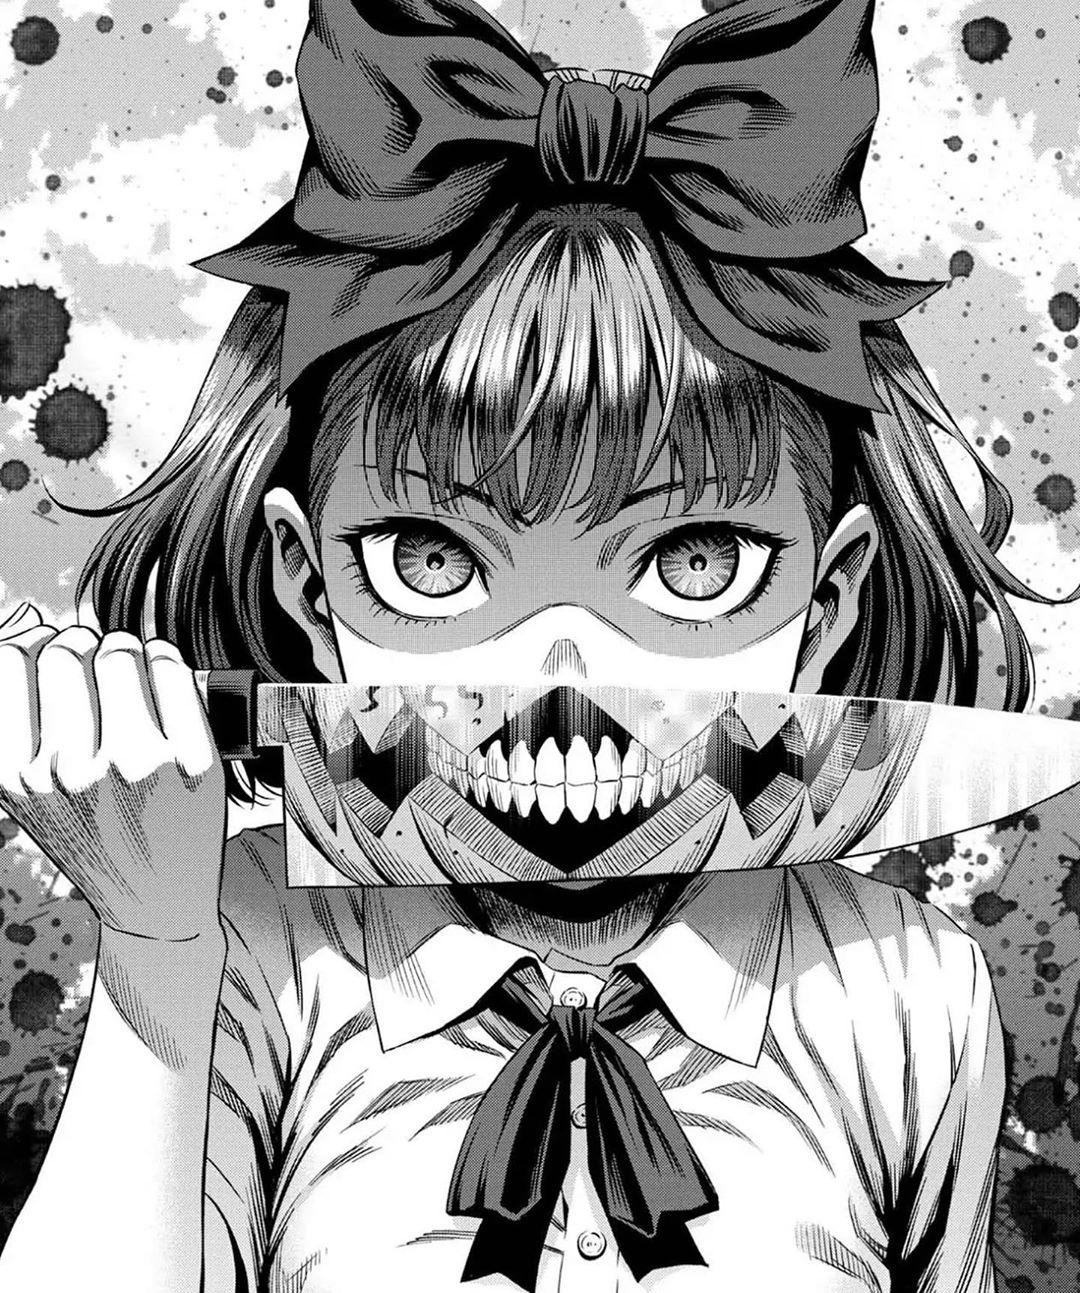 Wallpaper Manga Gore Knife Dark Low Saturation Monochrome